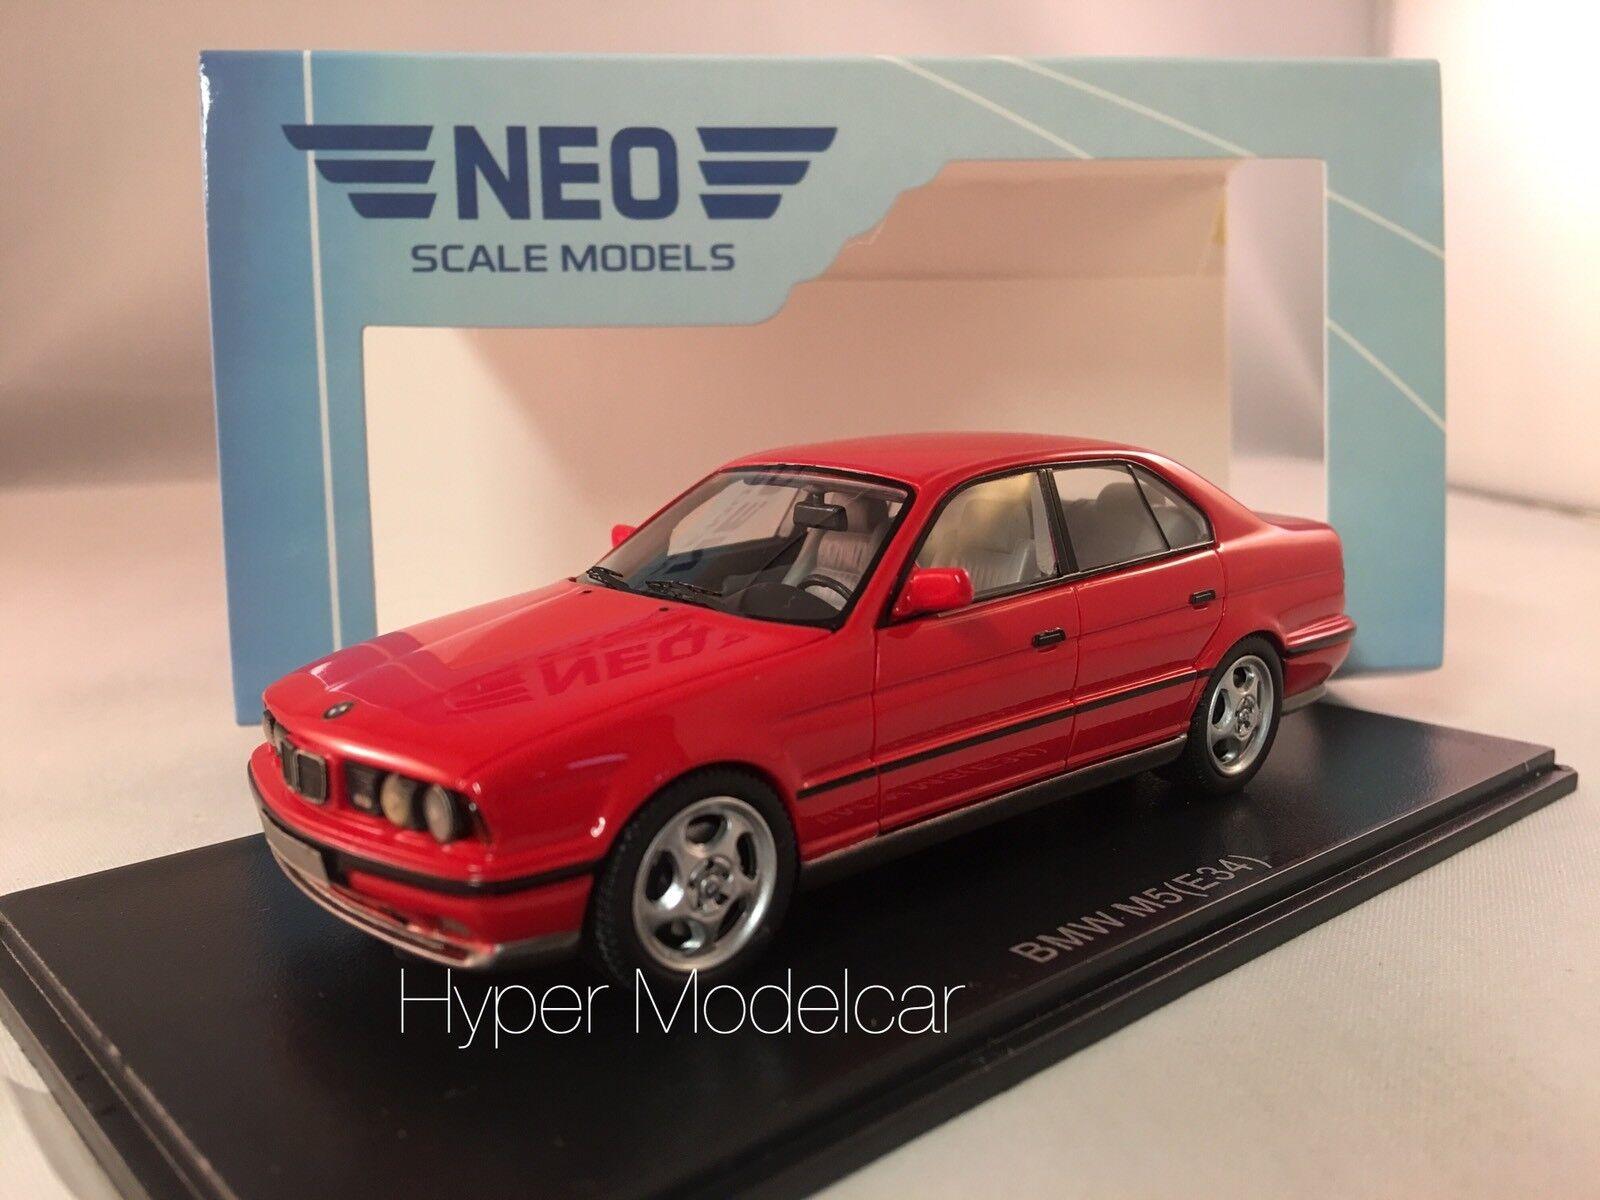 NEO SCALE MODEL 1/43 Bmw 5-Series M5 (E34) 1991 Red Art. Neo43314